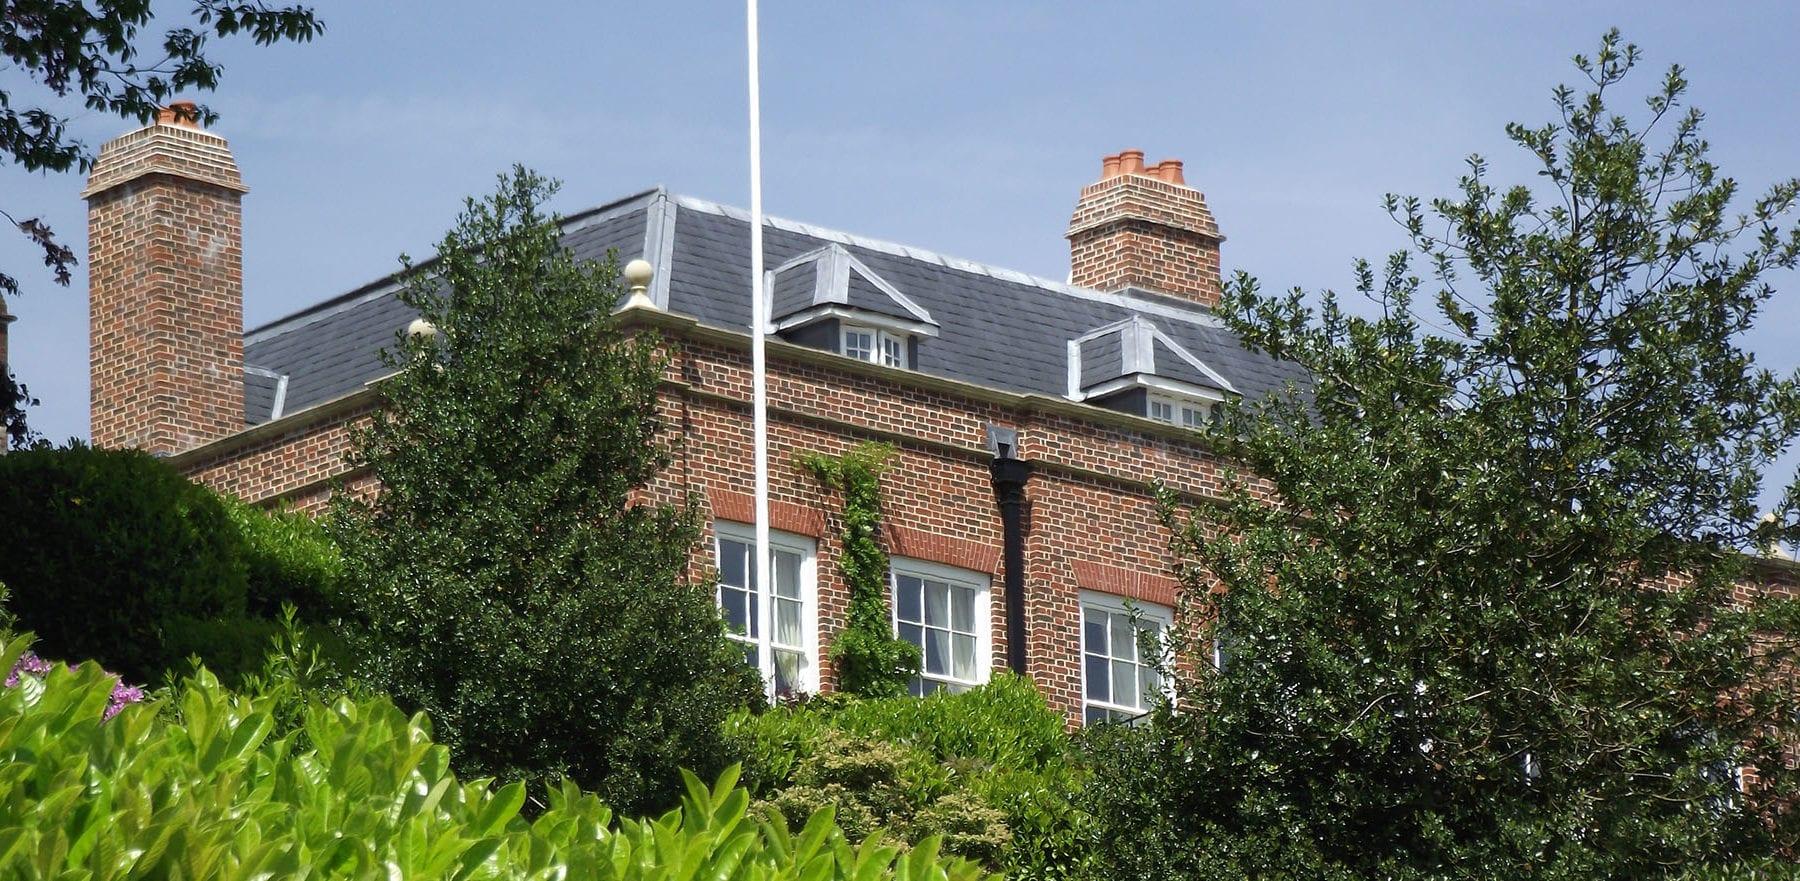 Lifestiles - Spanish Natural Slate Roof Tiles - Brook House, England 2